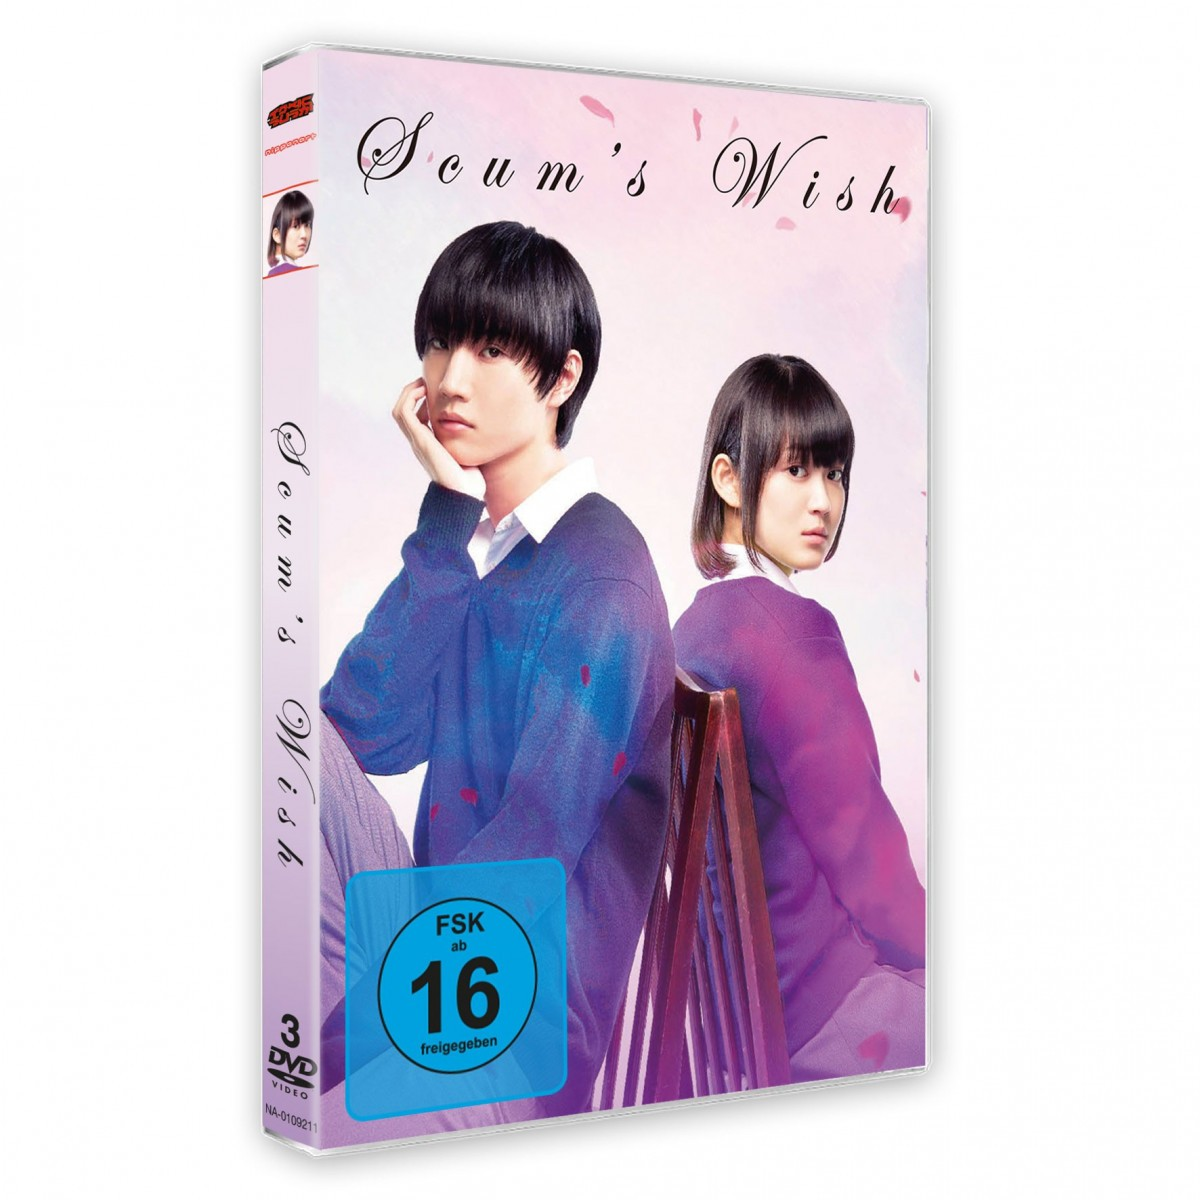 scums_wish_dvd_cover-3d_fsk.jpg